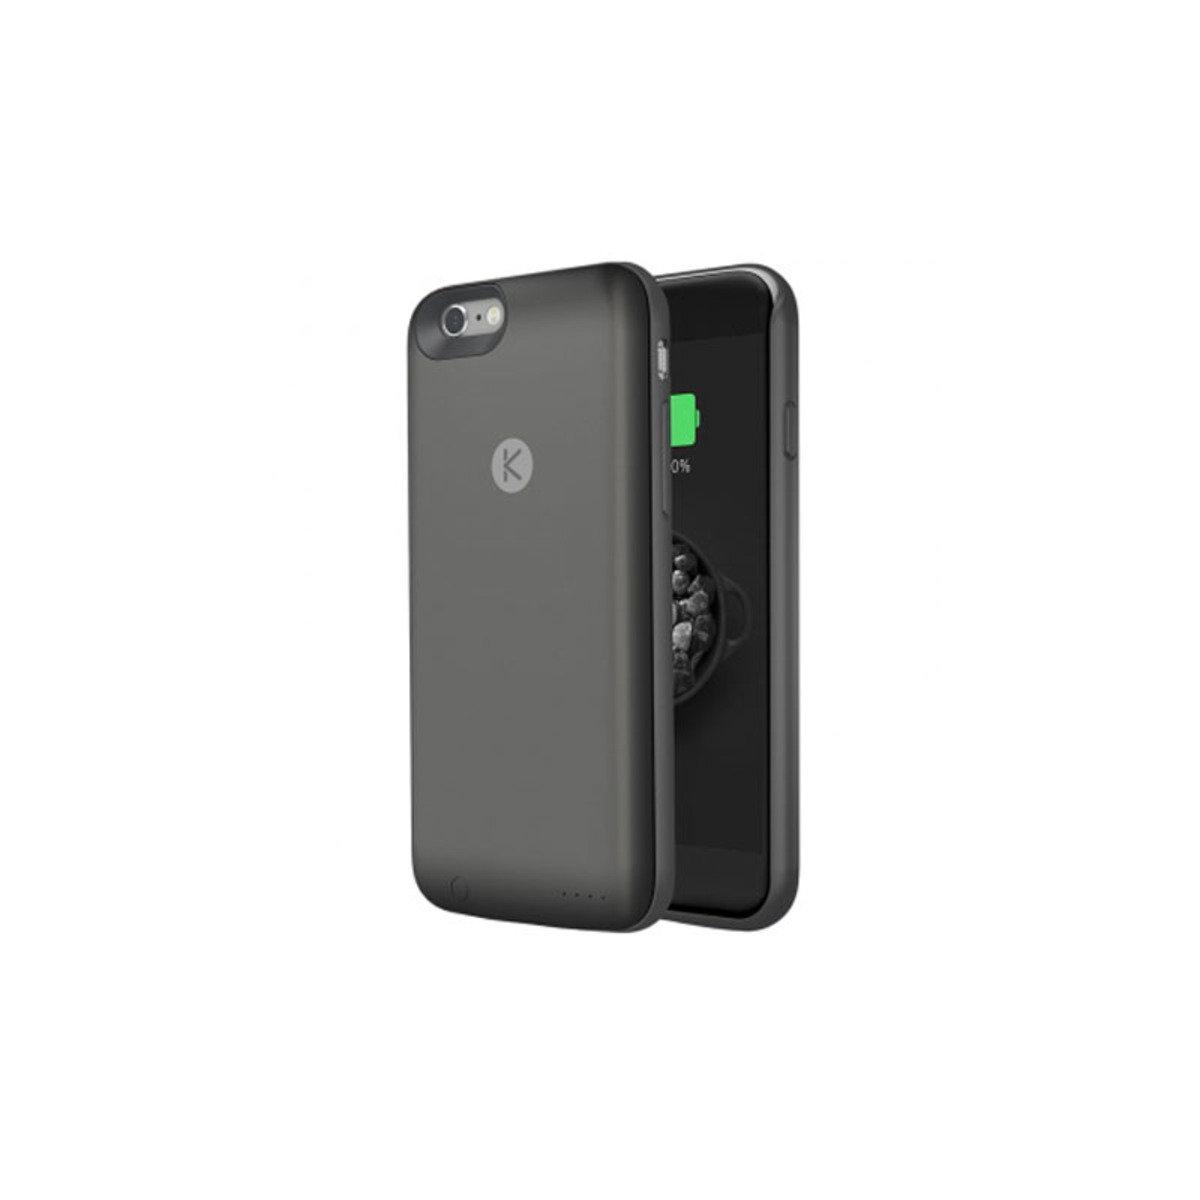 iPhone 6 / 6S 專用機殼內置64GB連2400mAh充電池 黑色+黑色